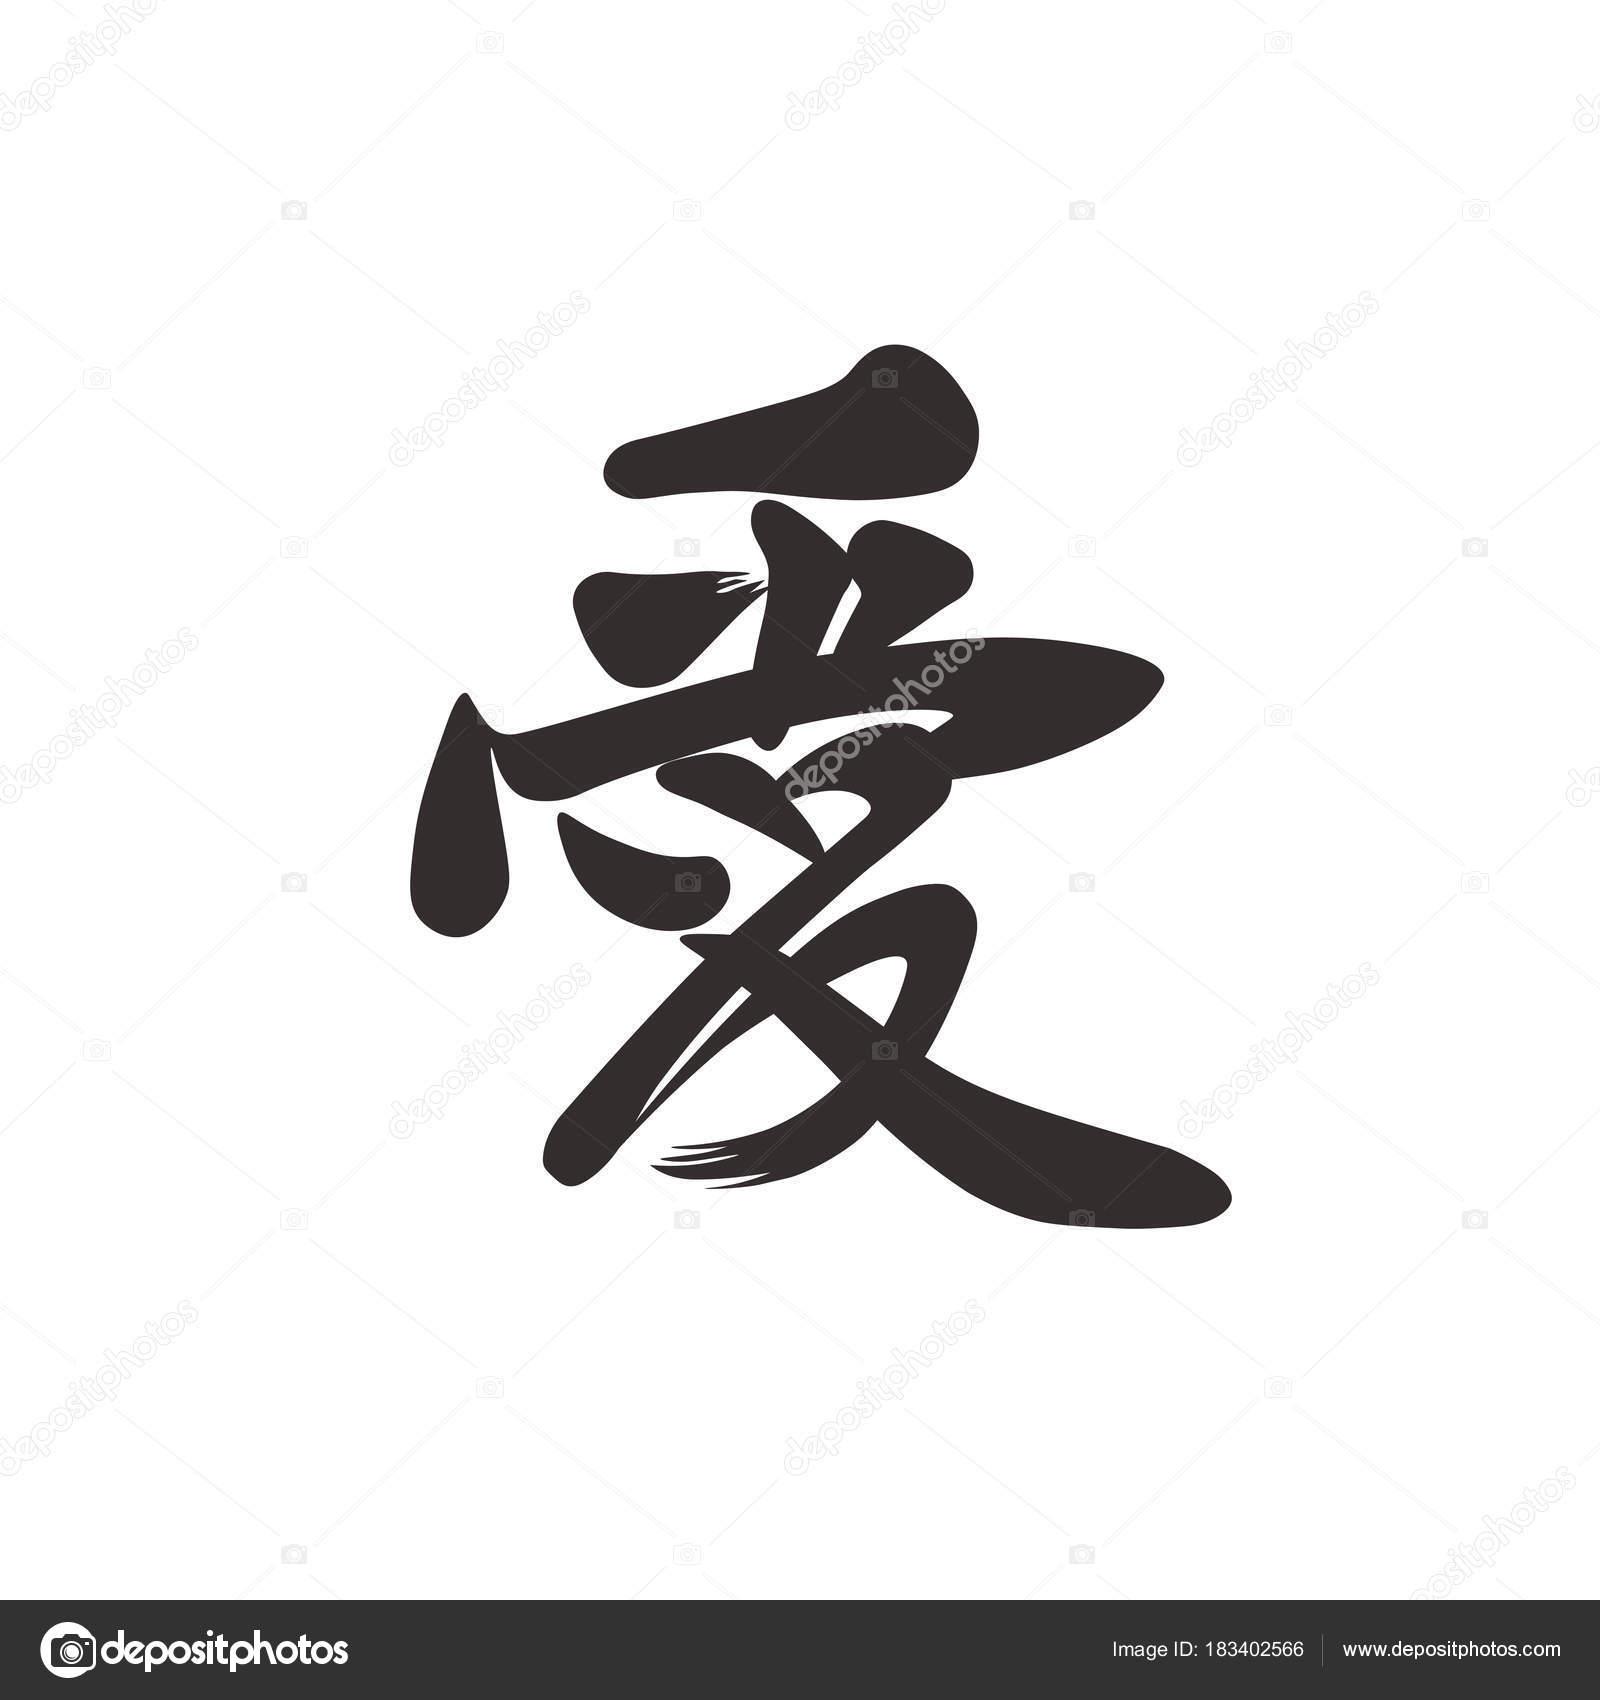 depositphotos_183402566-stock-illustration-chinese-hand-drown-hieroglyph-love.jpg